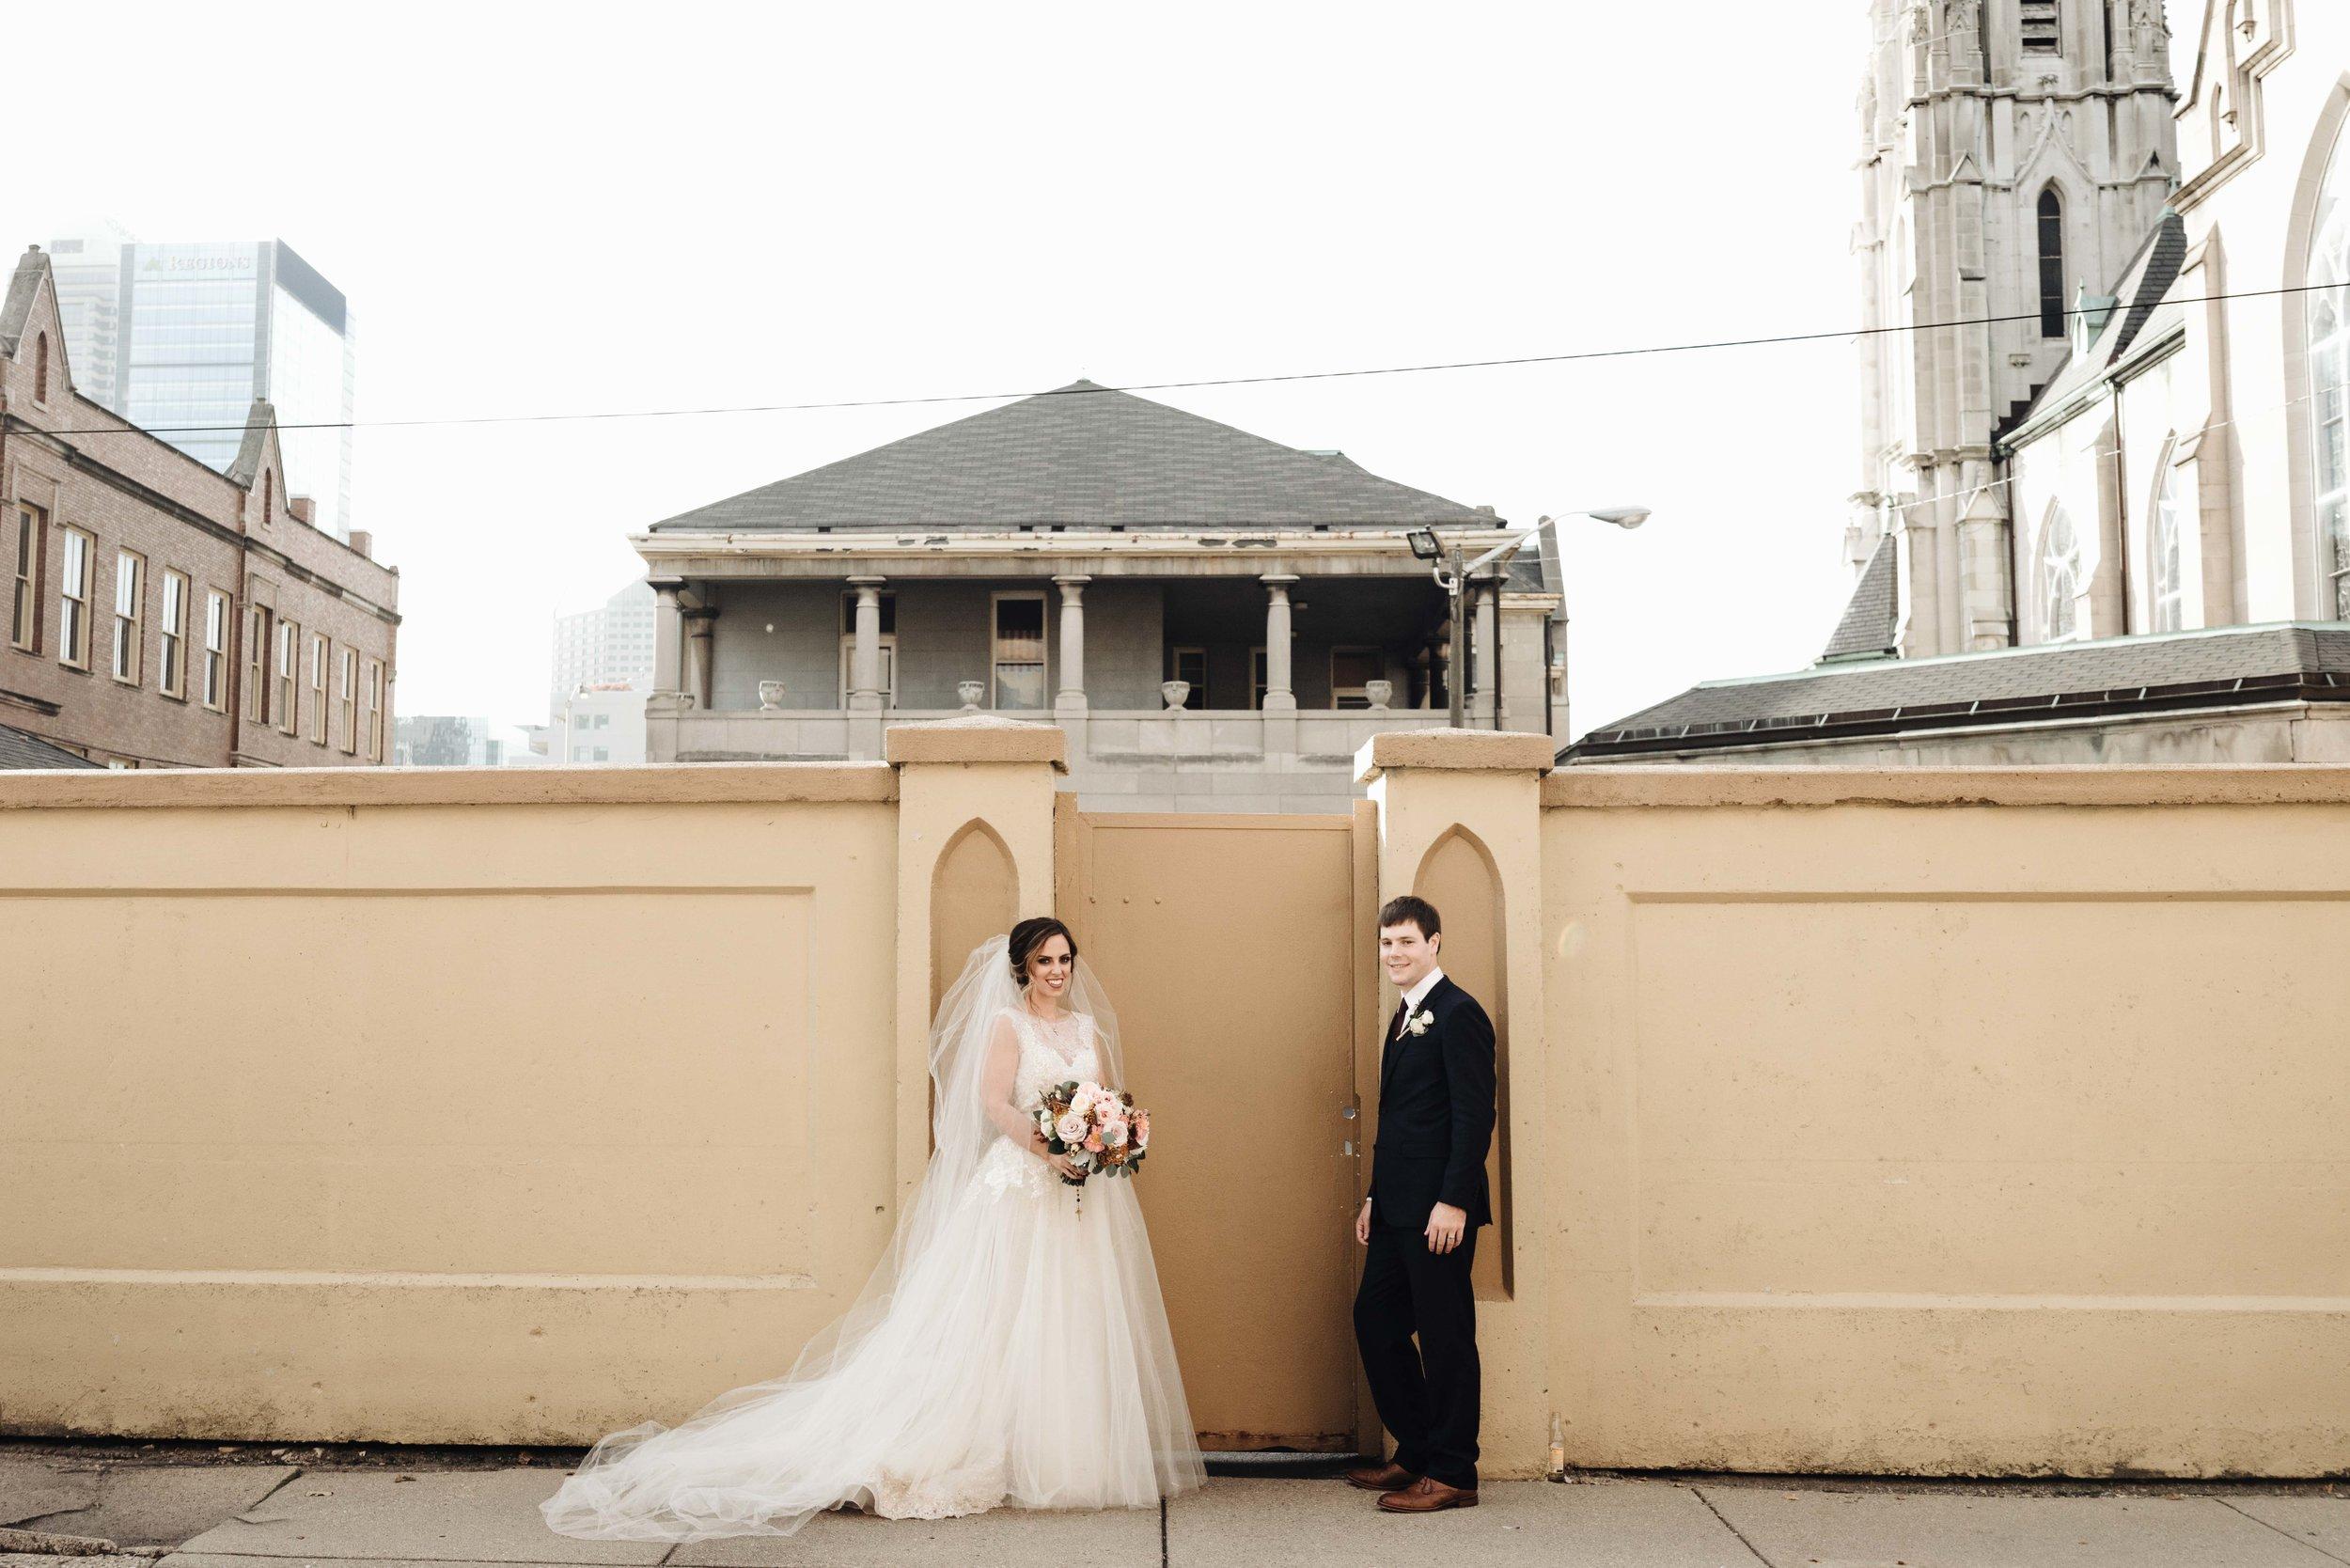 Carlee-Bob-Indianapolis-Wedding-Blog-70.jpg